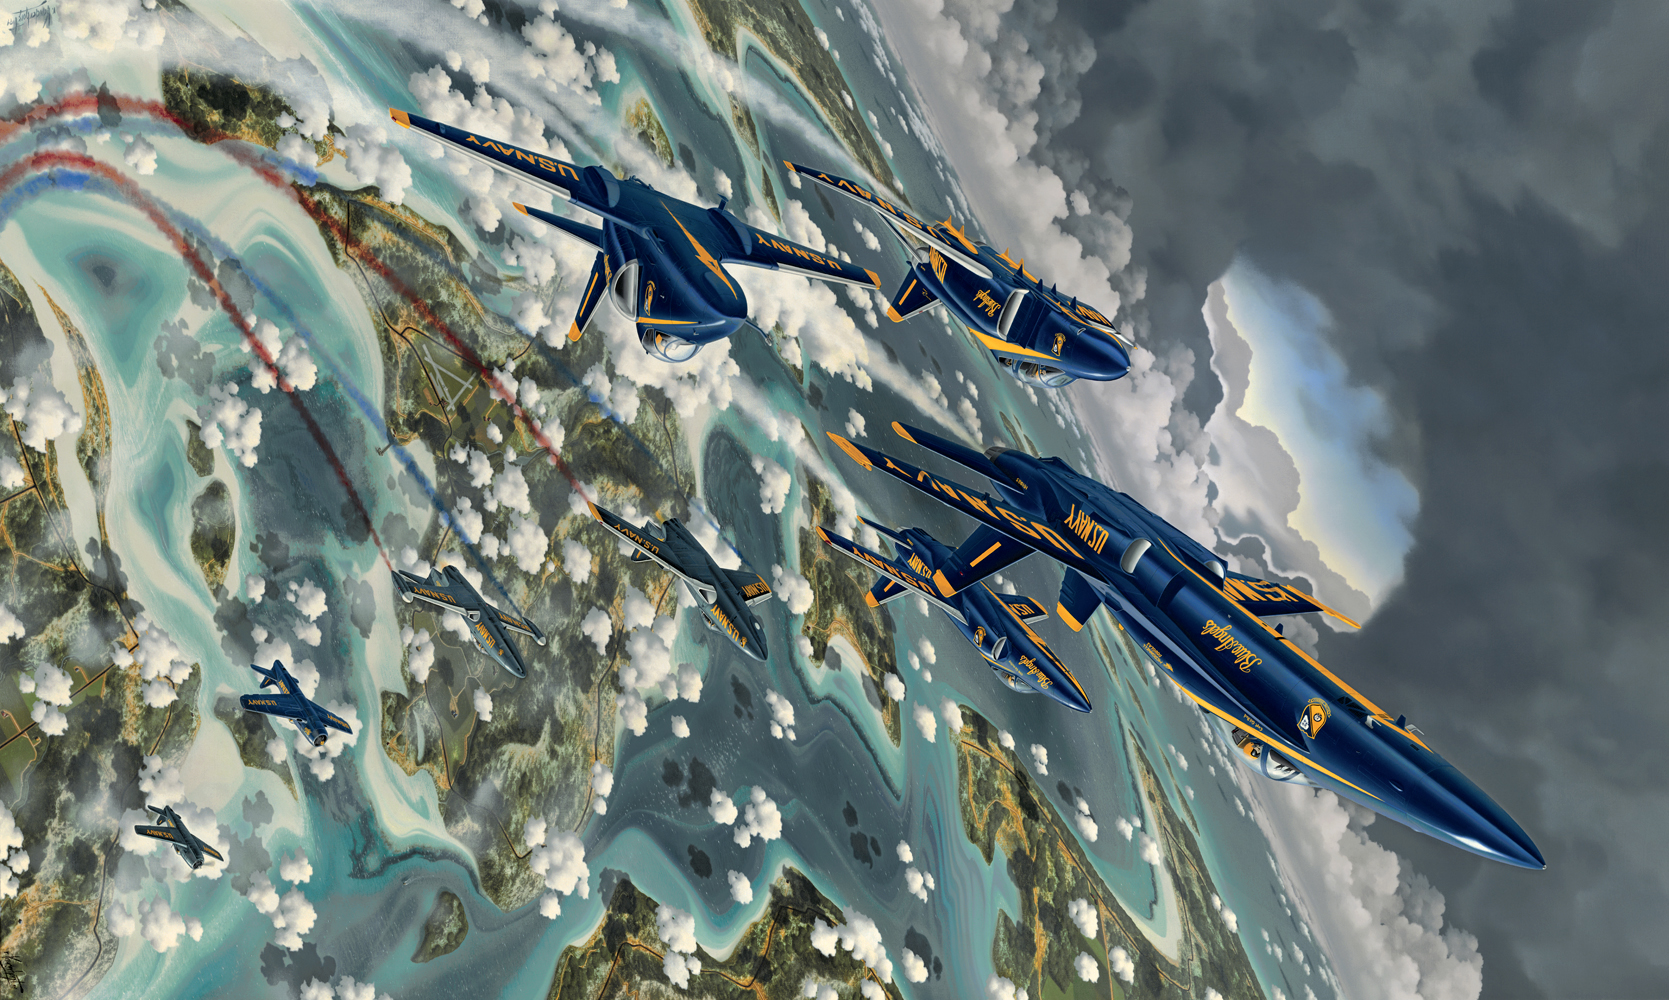 BLUE ANGELS - View 2.jpg